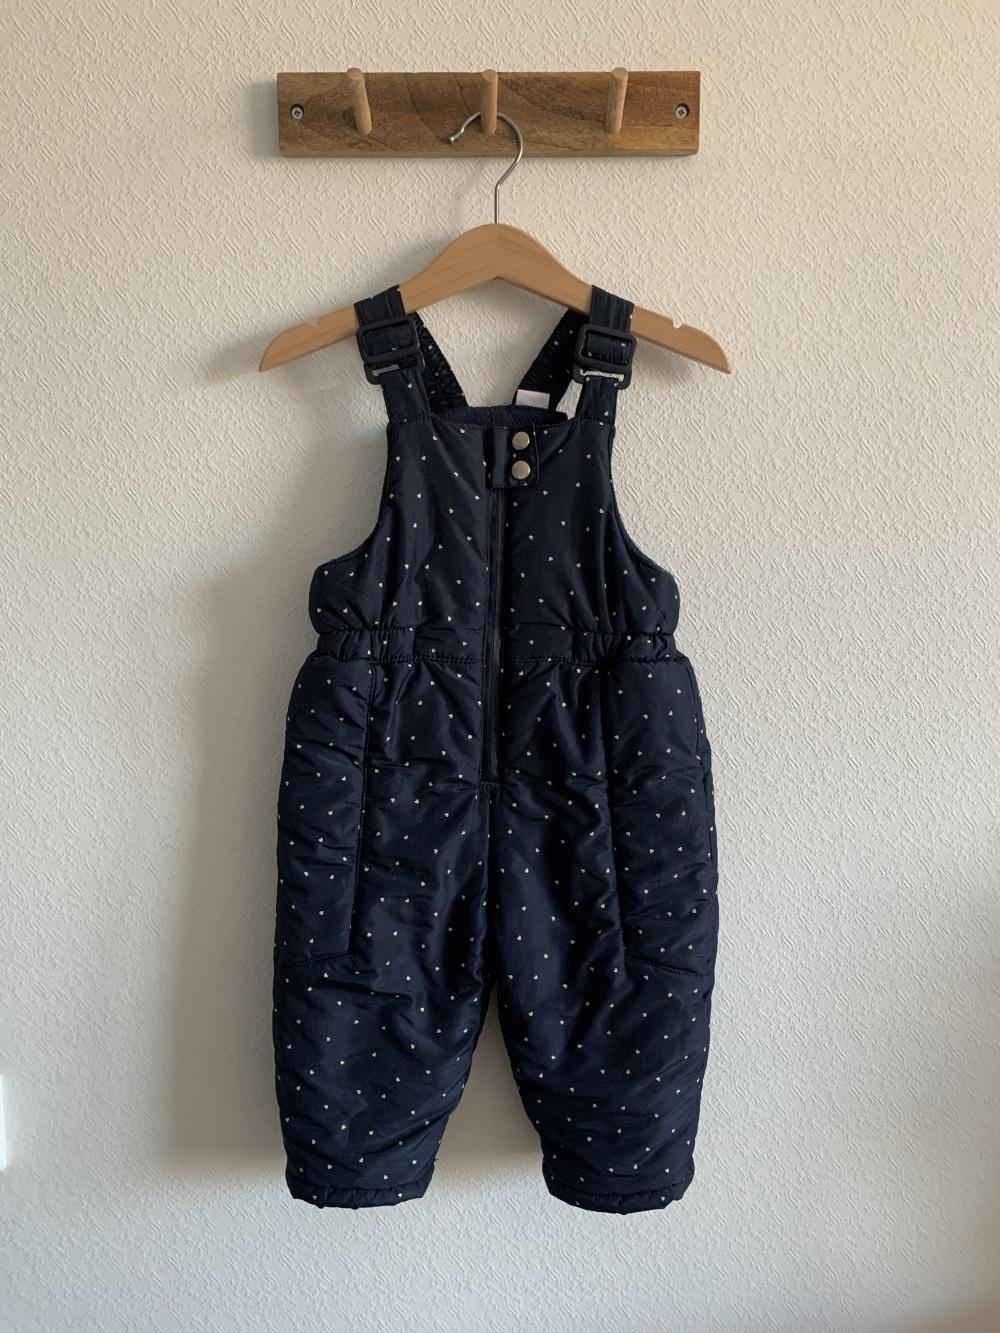 Полукомбинезон Zara, 86 размер